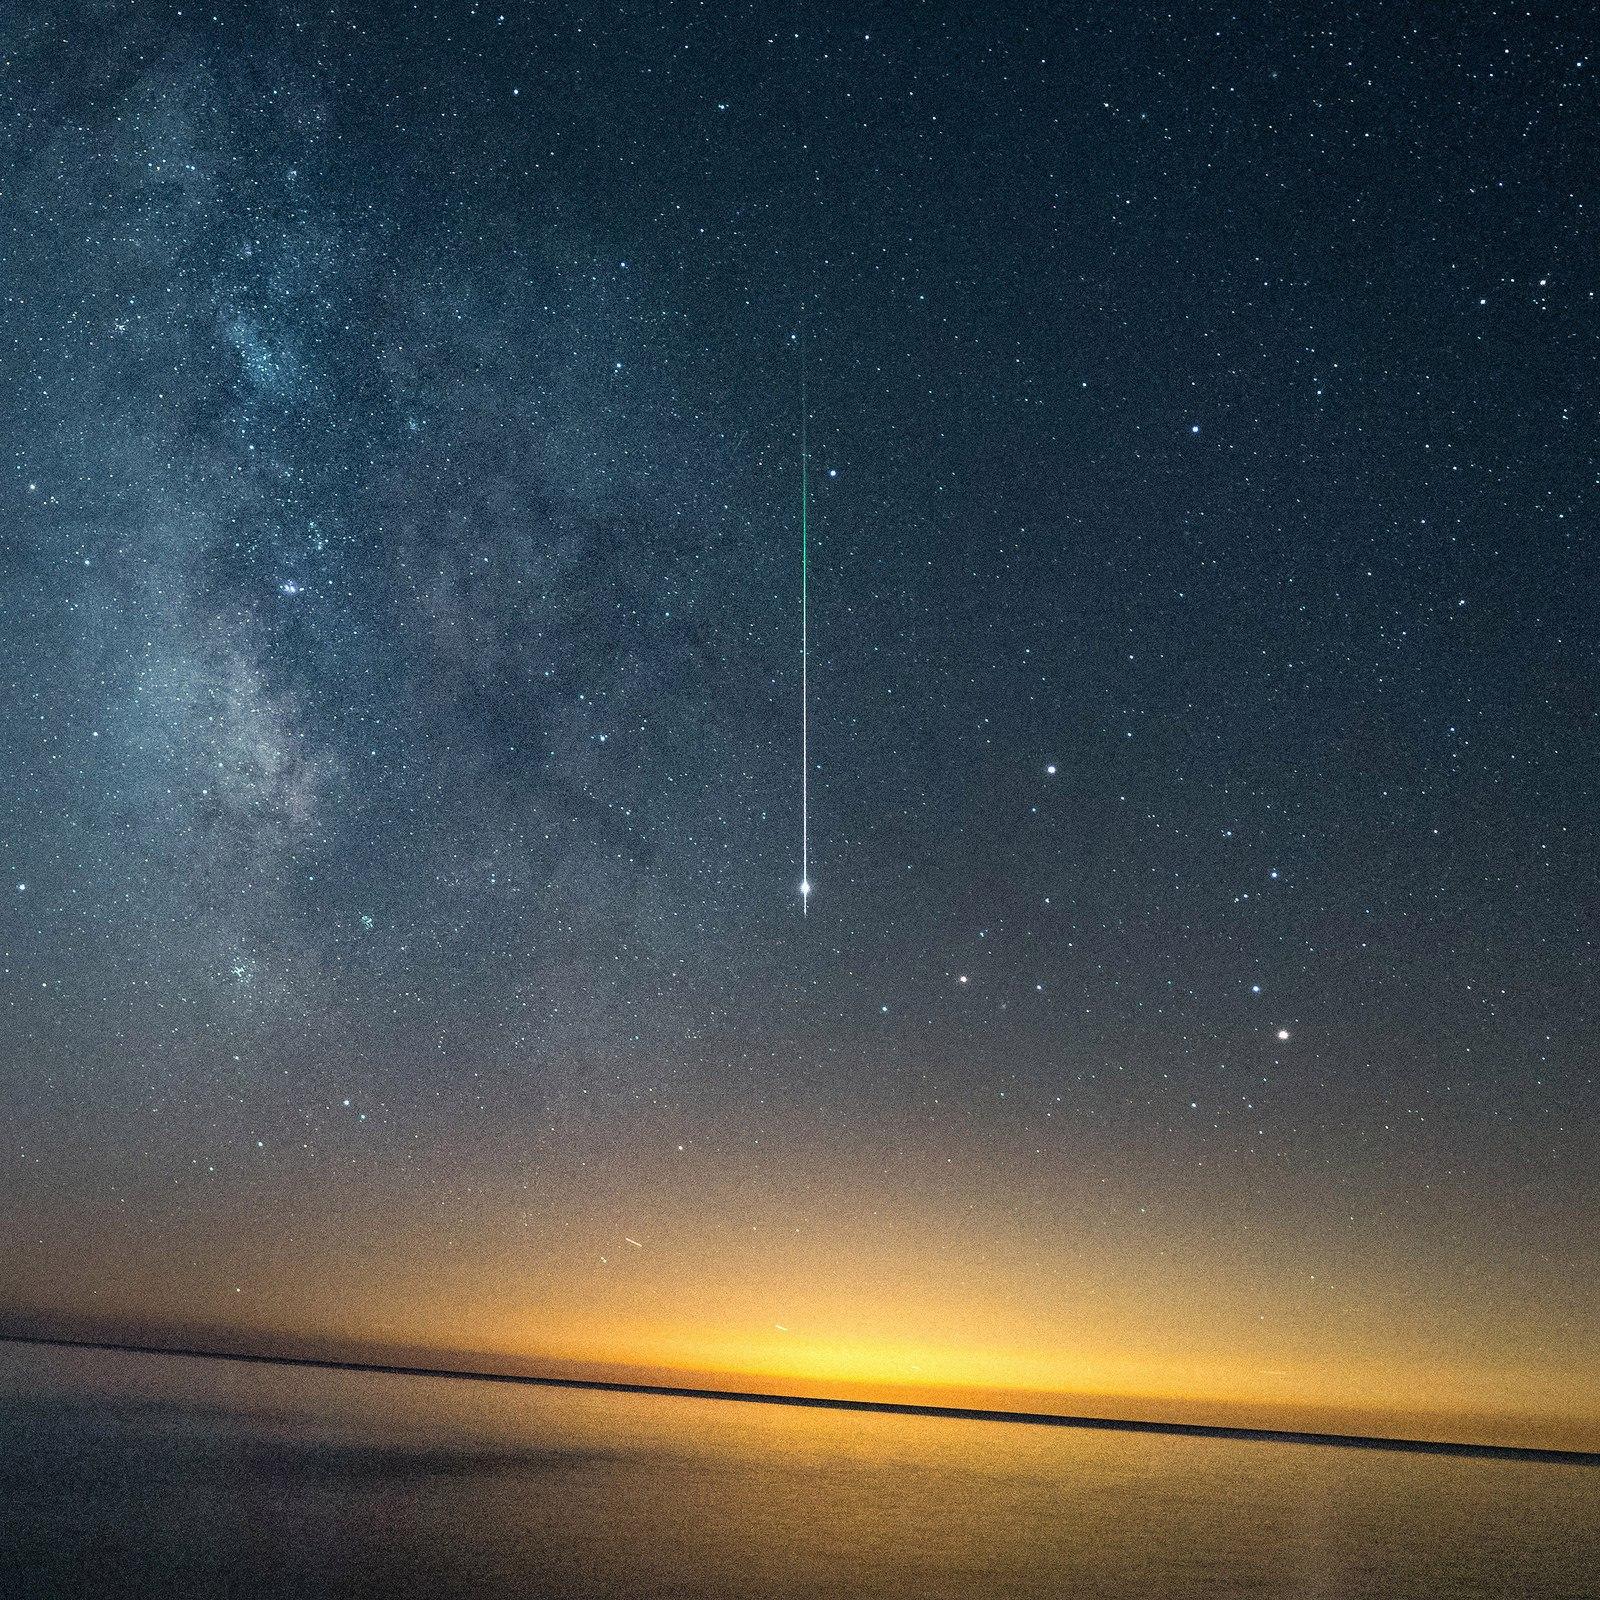 Звёздное небо и космос в картинках - Страница 6 4nTW8VrQTqQ